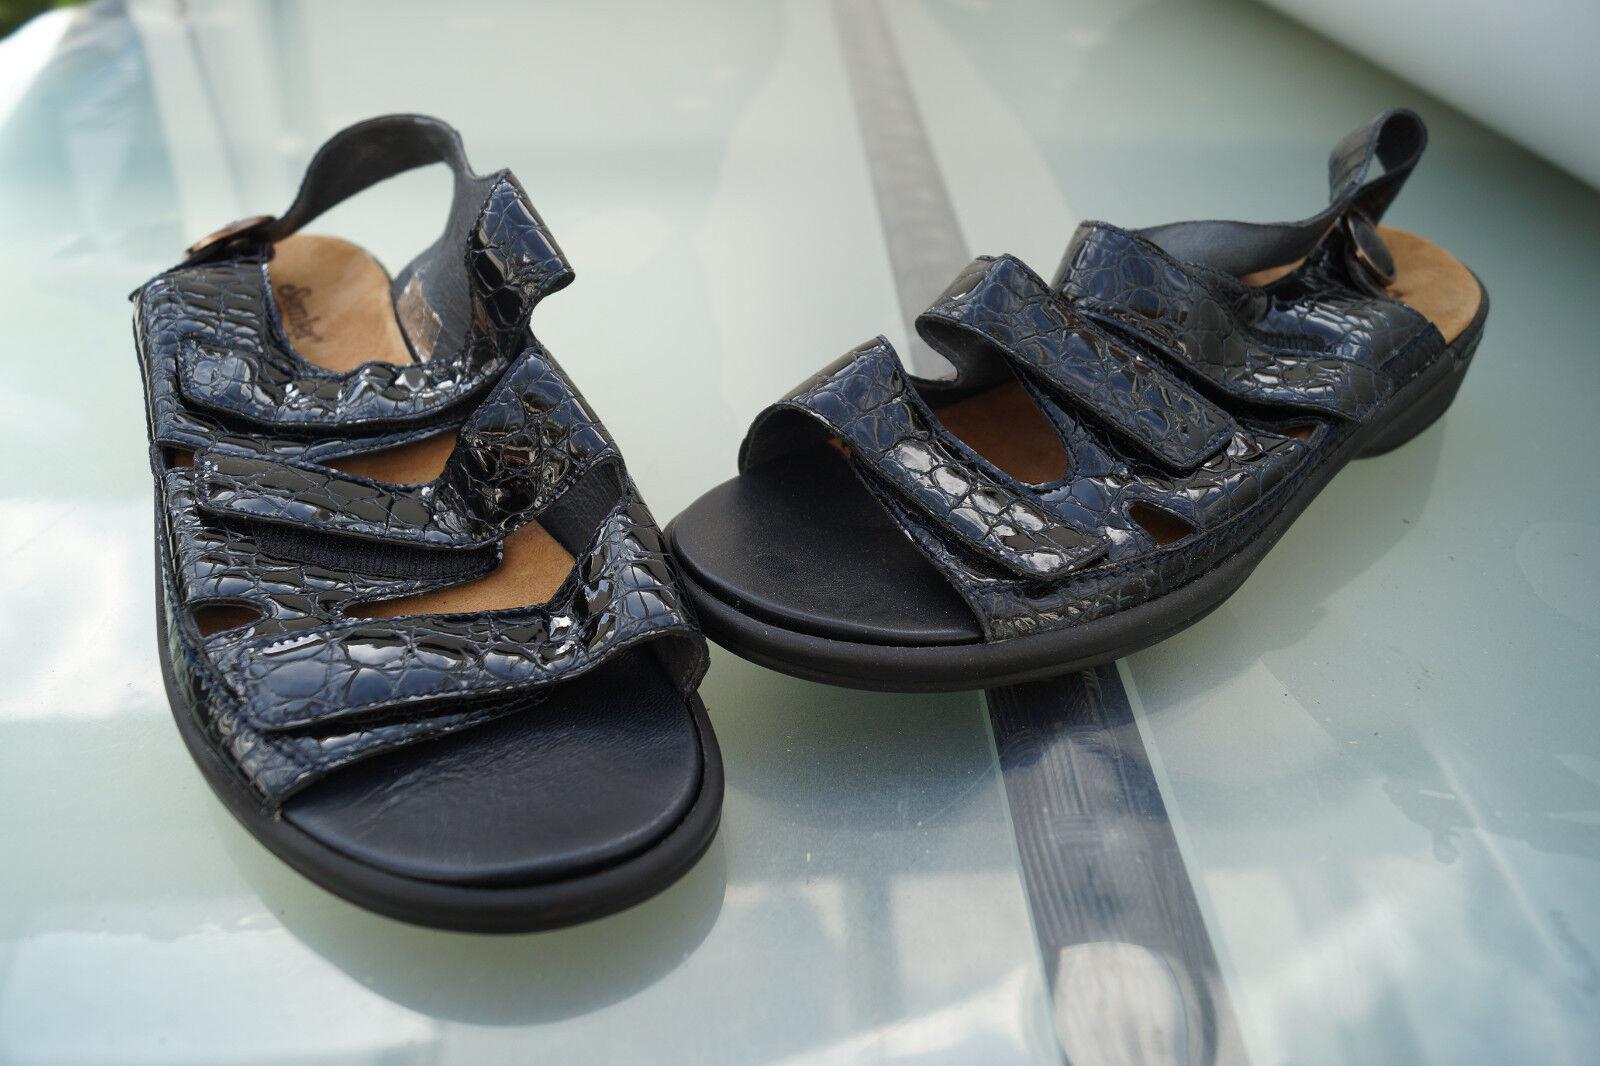 Semler Donna Comfort Scarpe Sandali in Velcro Nero M. depositi tg. 8,5/42,5 Nero Velcro Nuovo bf14a4